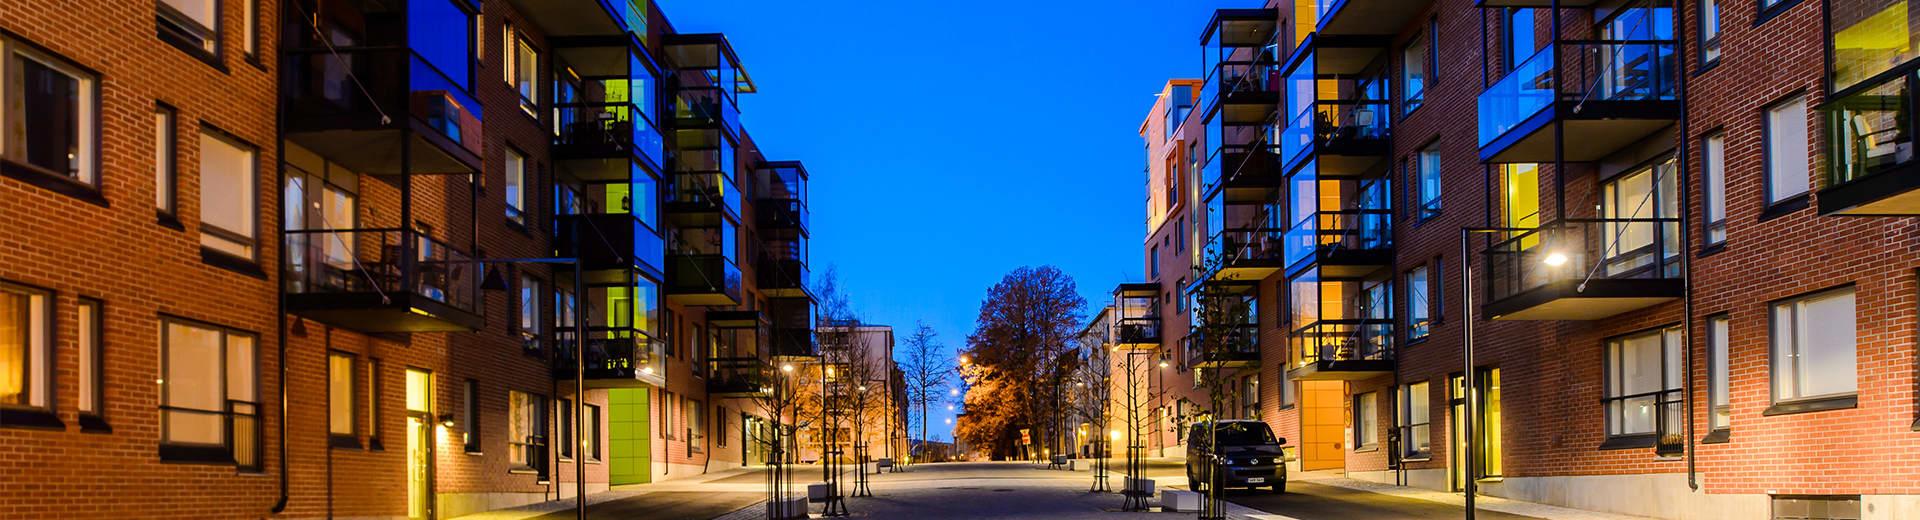 Myytävät asunnot Helsingin Vallilan Konepajalla